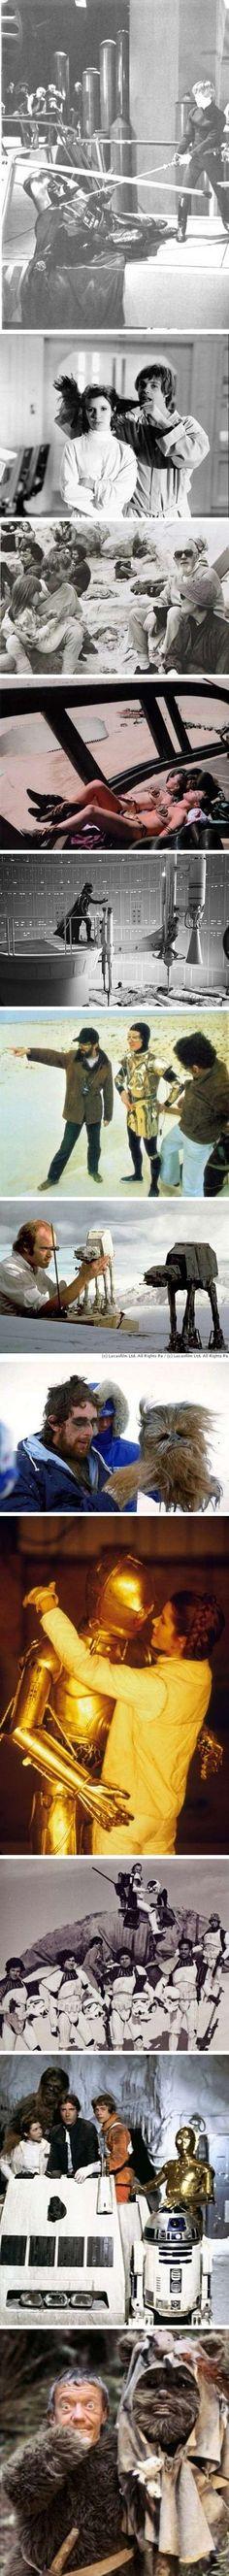 Star Wars (Episodes IV - VI) behind the scenes